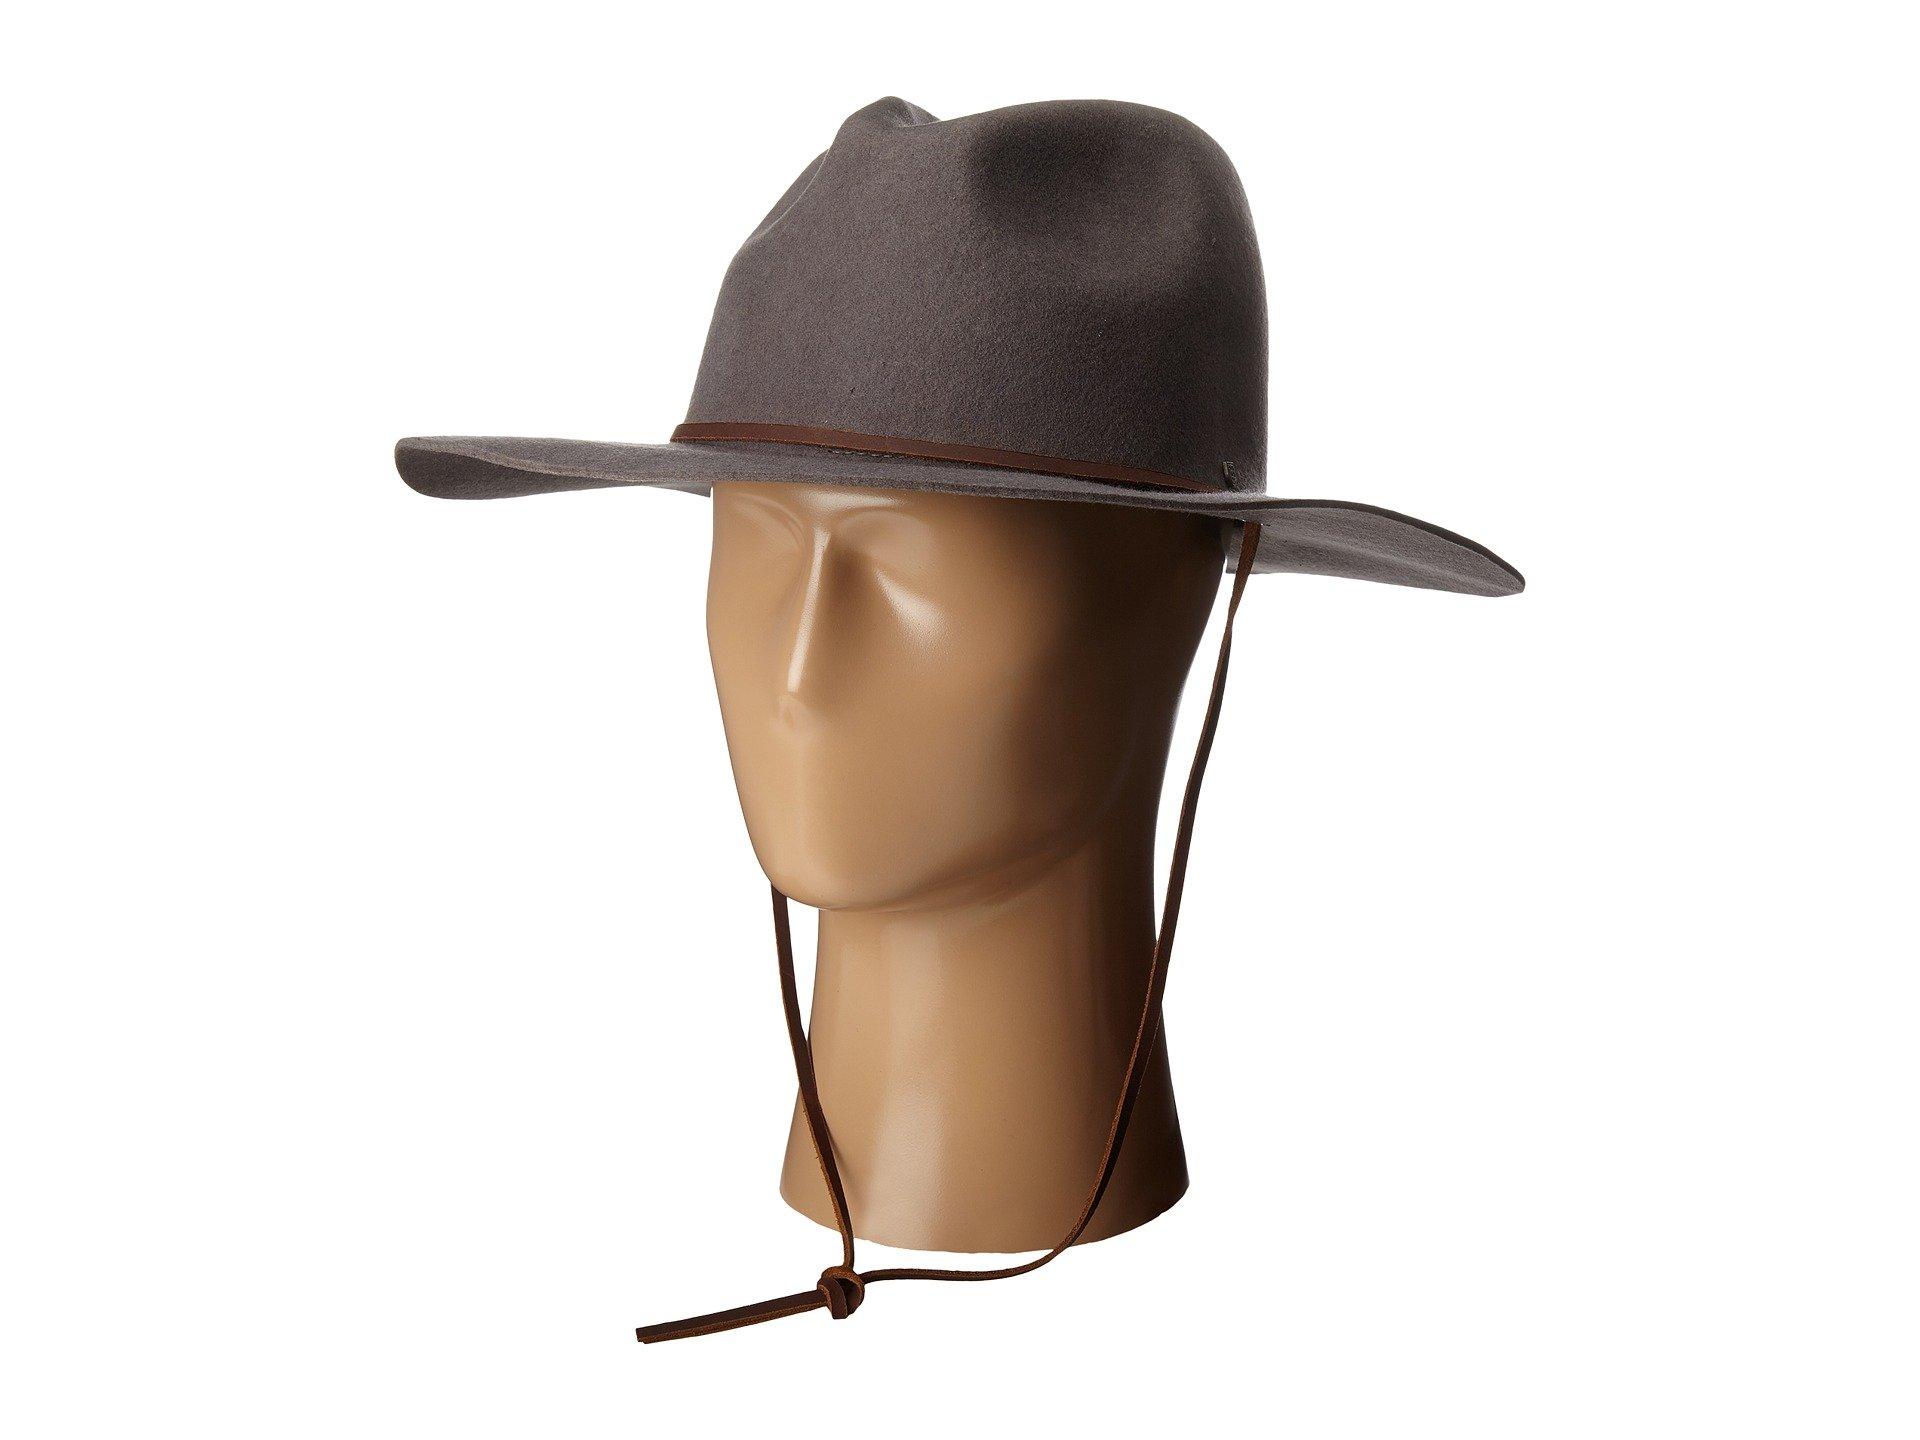 a7d2db7020d Wide brim felt hat. Leather strap. Metal logo shield adorns side. Textile  headband for comfortable wear. Imported. Product measurements were taken  using ...